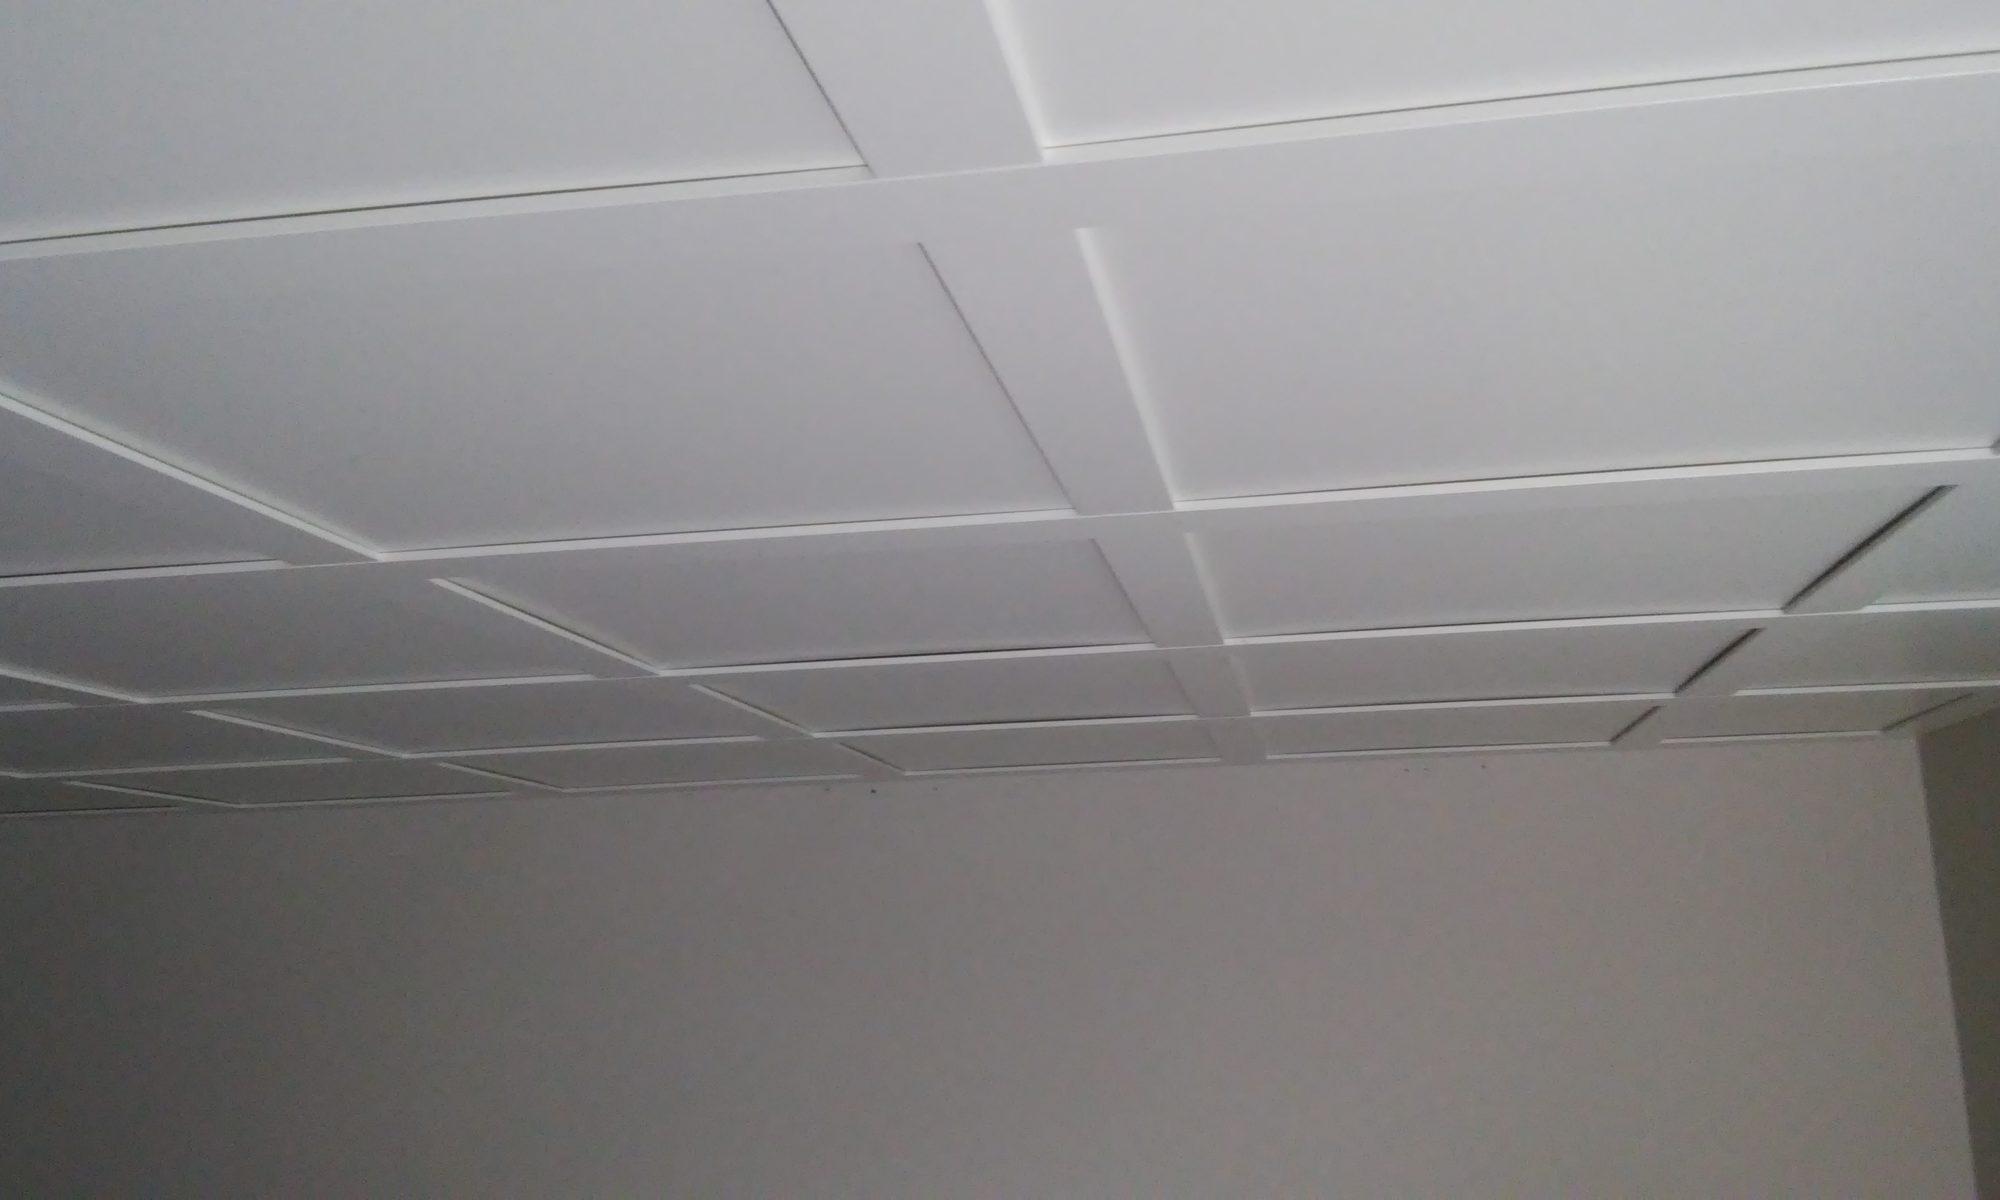 plafond suspendu embassy b titelle inc. Black Bedroom Furniture Sets. Home Design Ideas